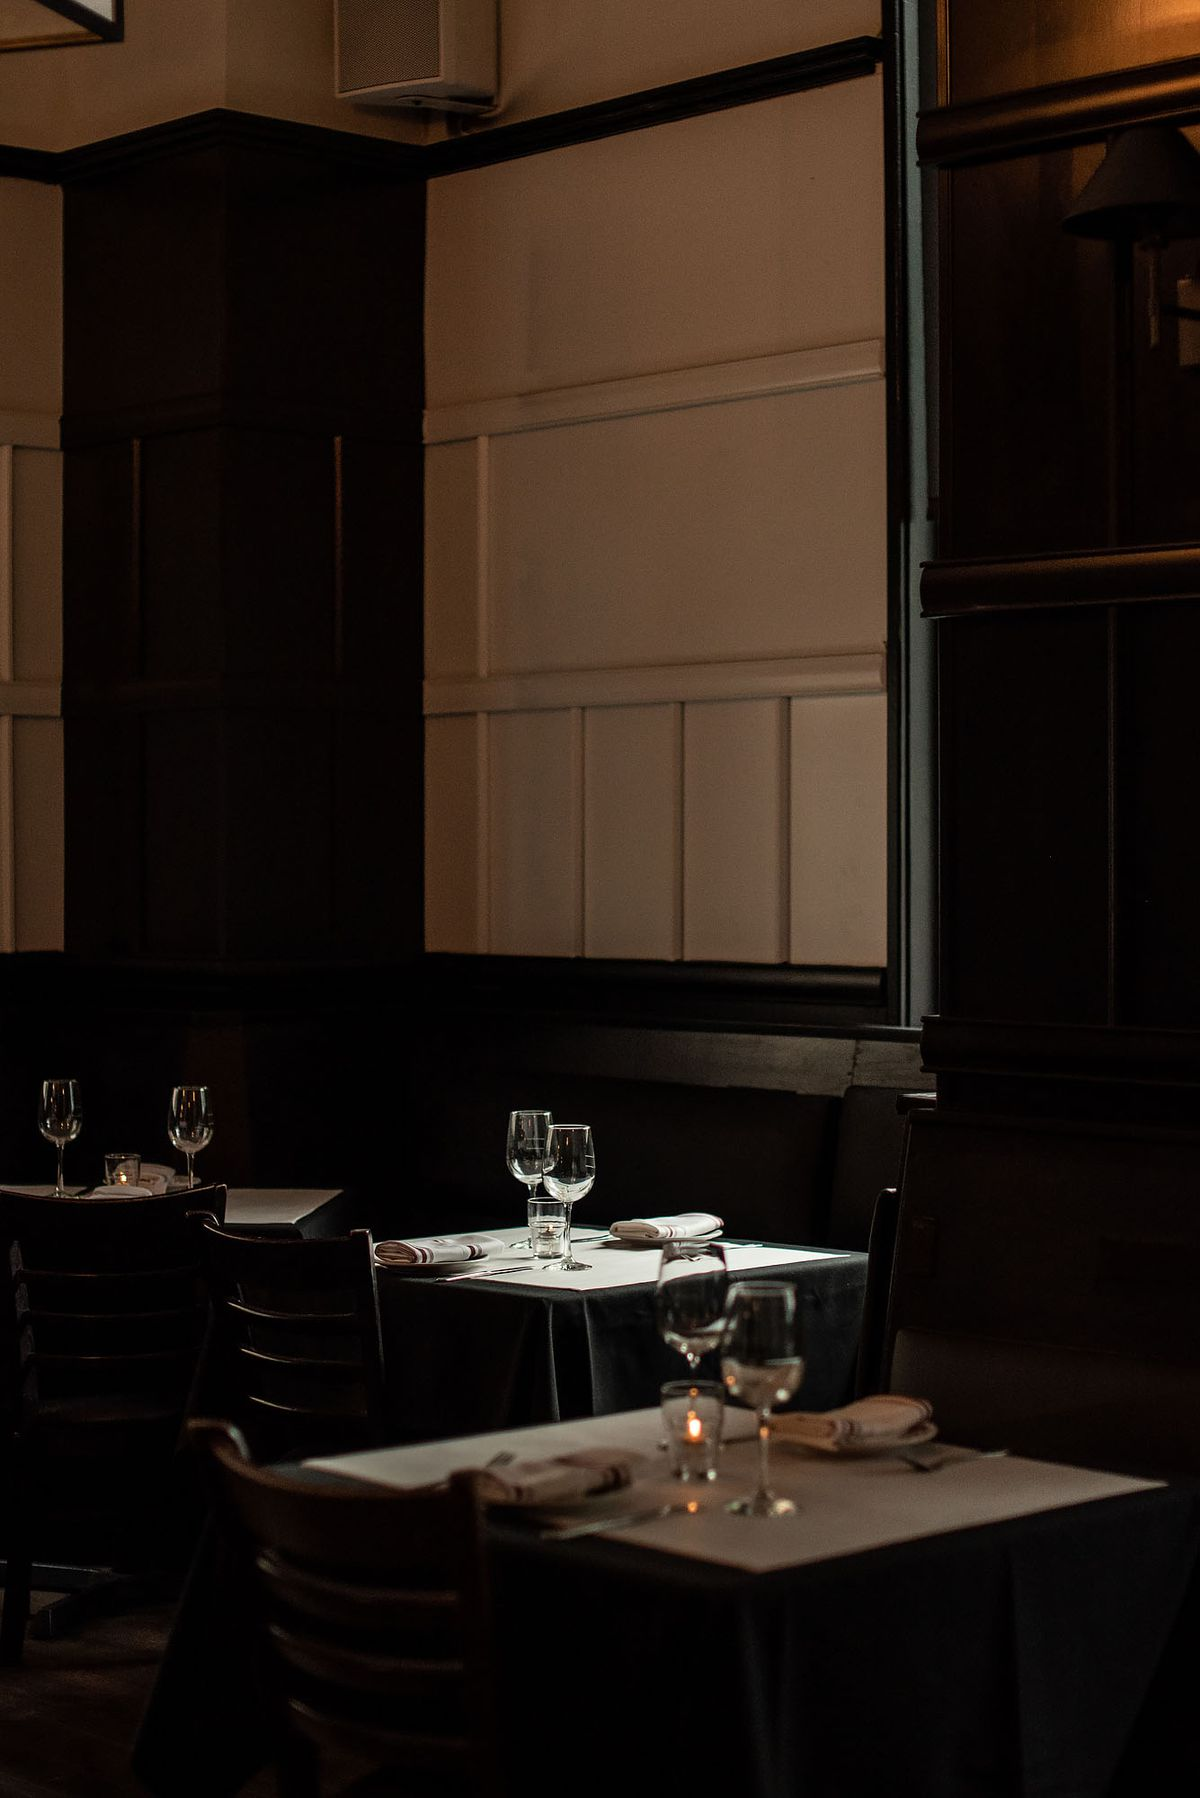 A pendant light glows over a single table inside a fine dining restaurant.